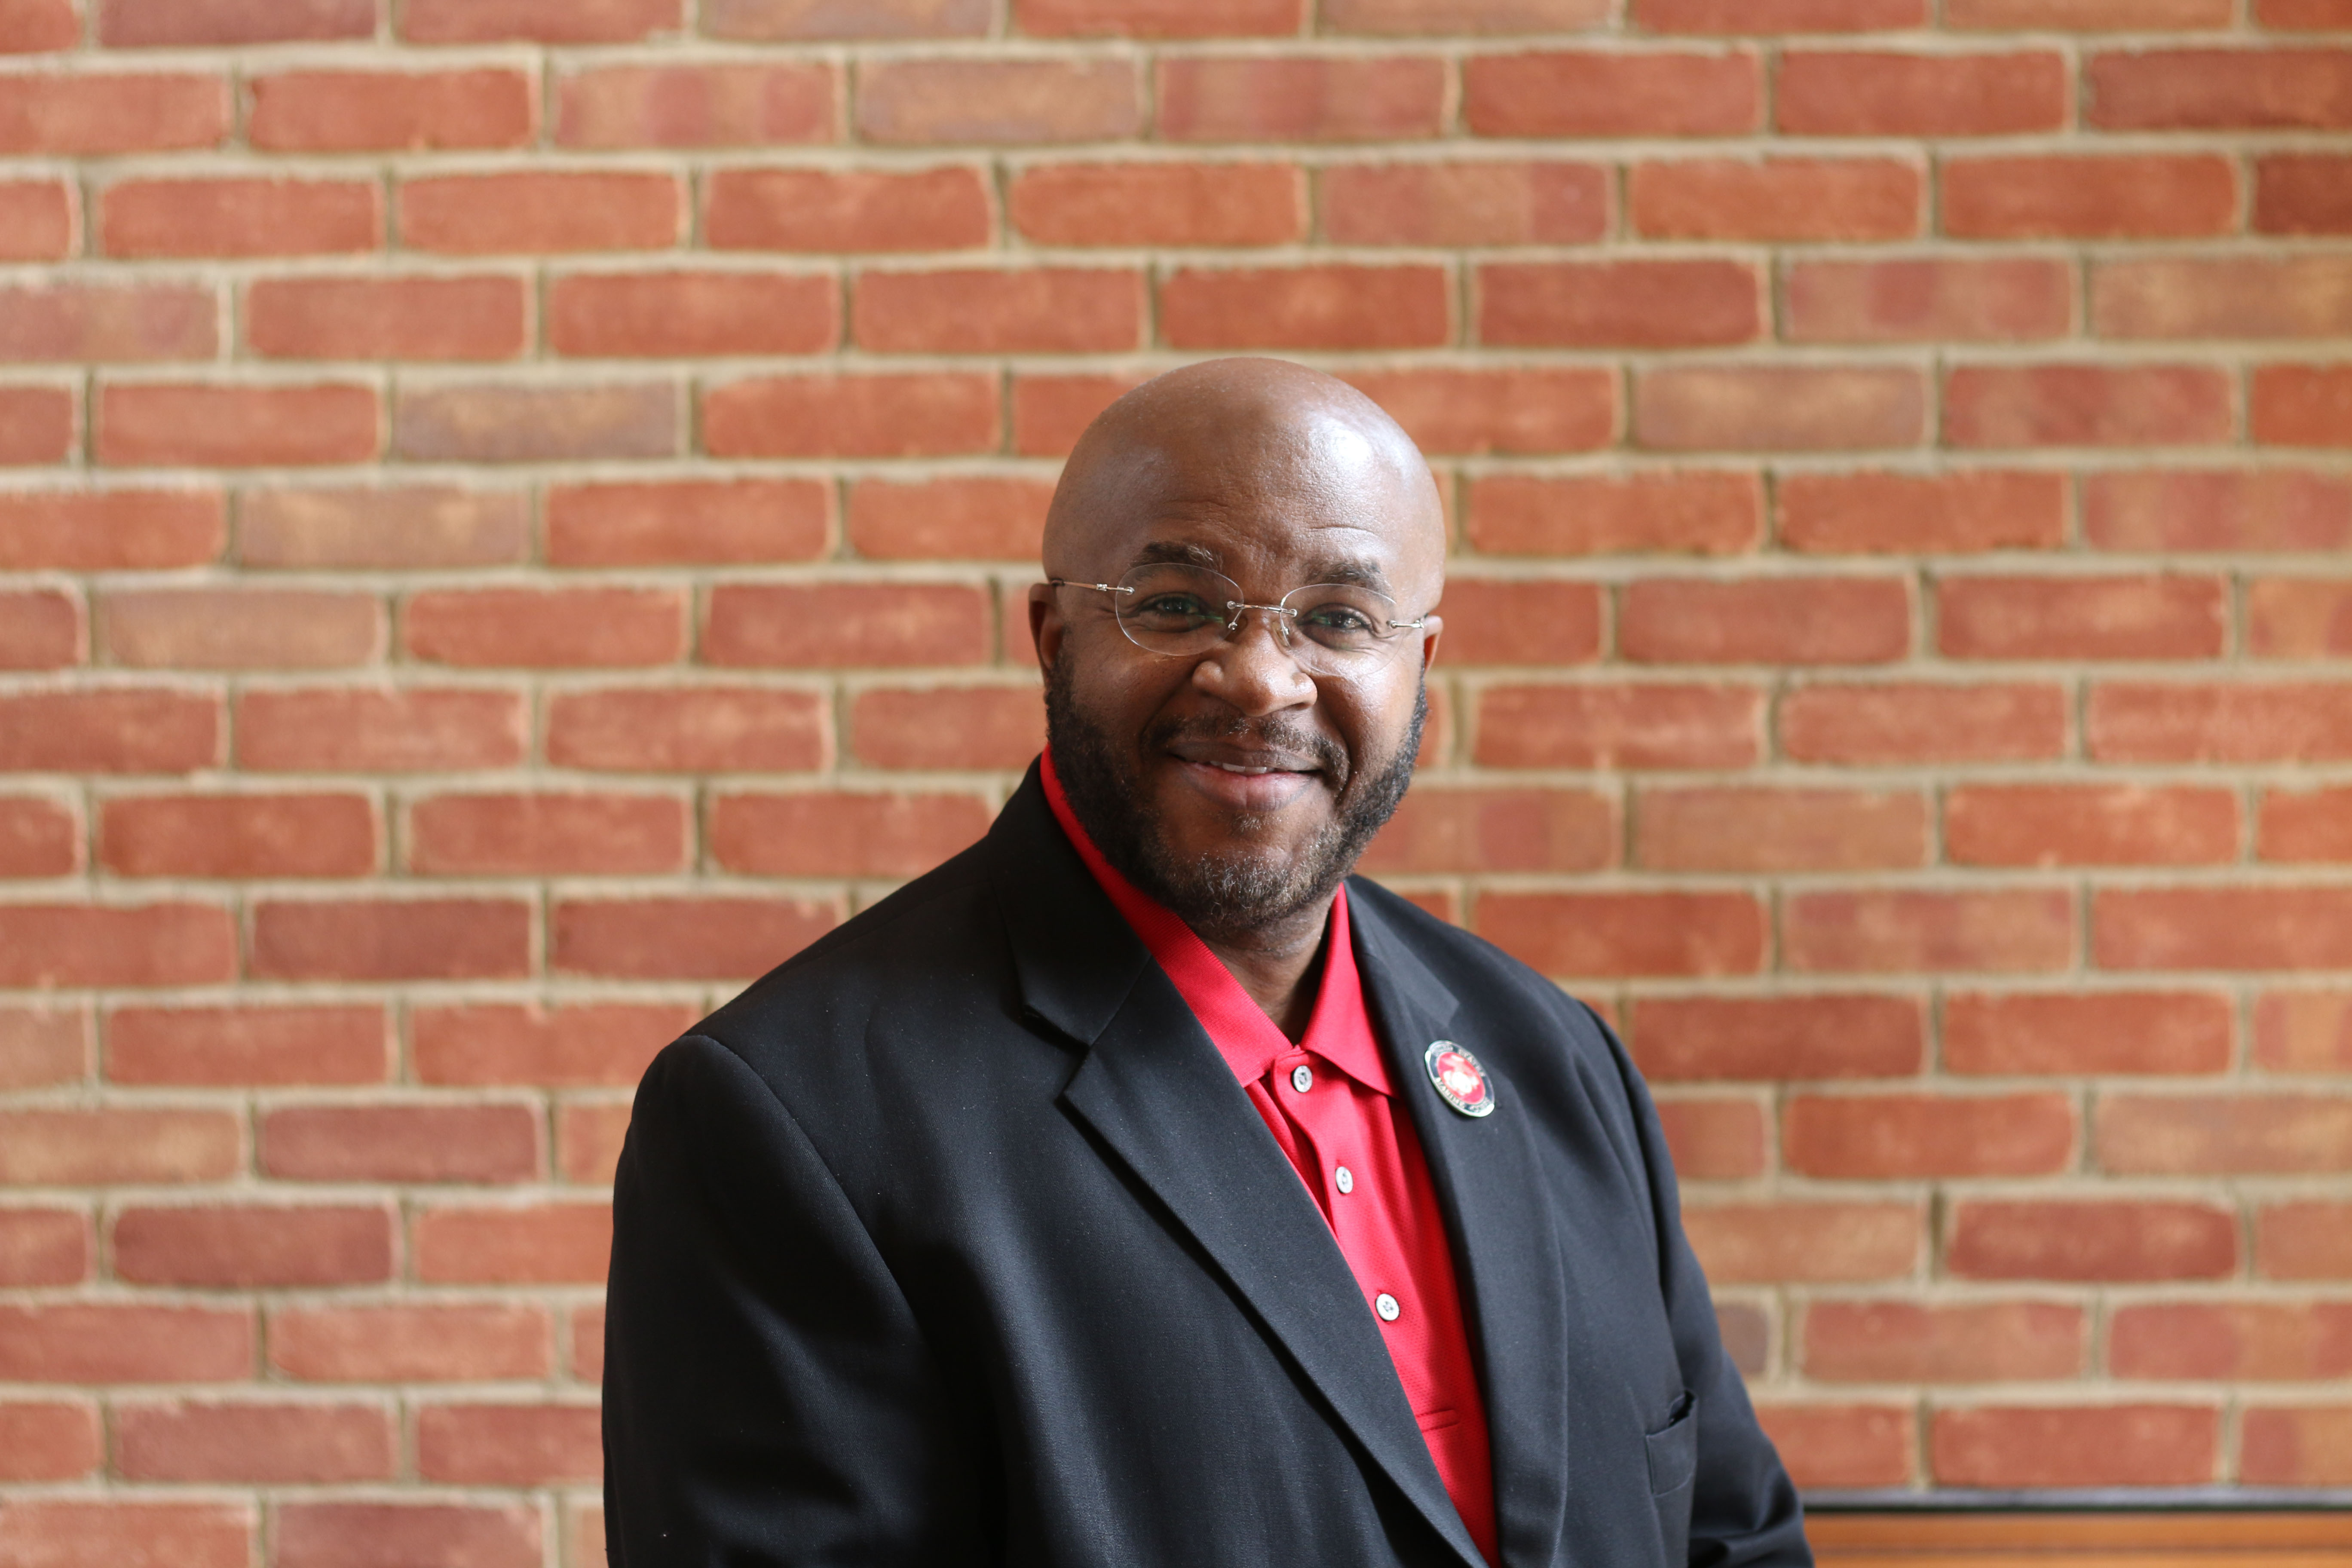 Picture of David Harrison Senior Director